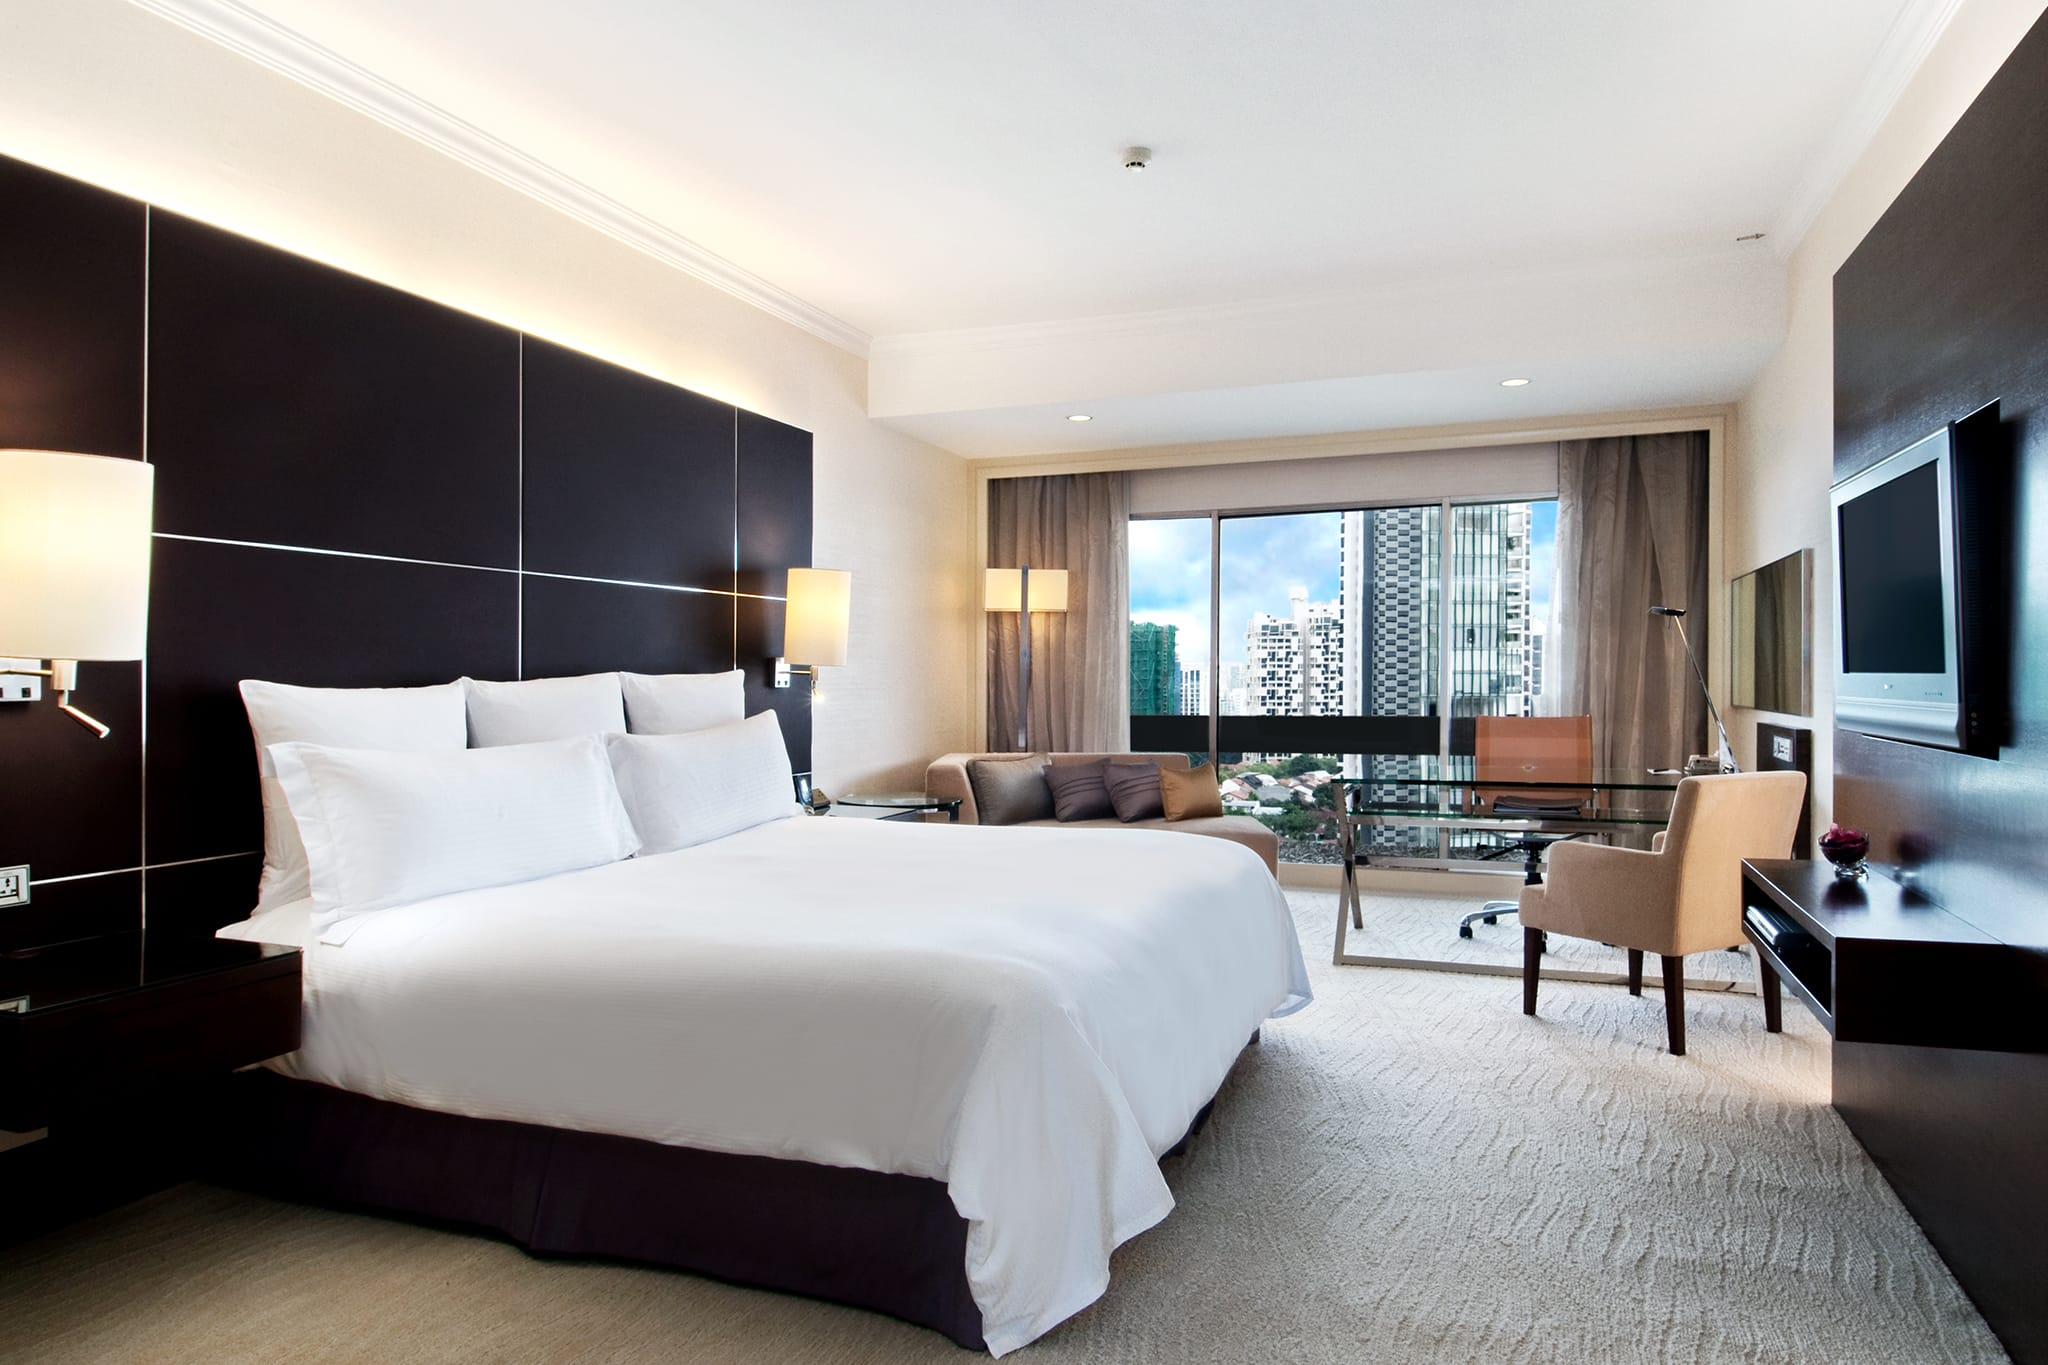 Hotels in Singapur – Hilton Singapore – Singapur